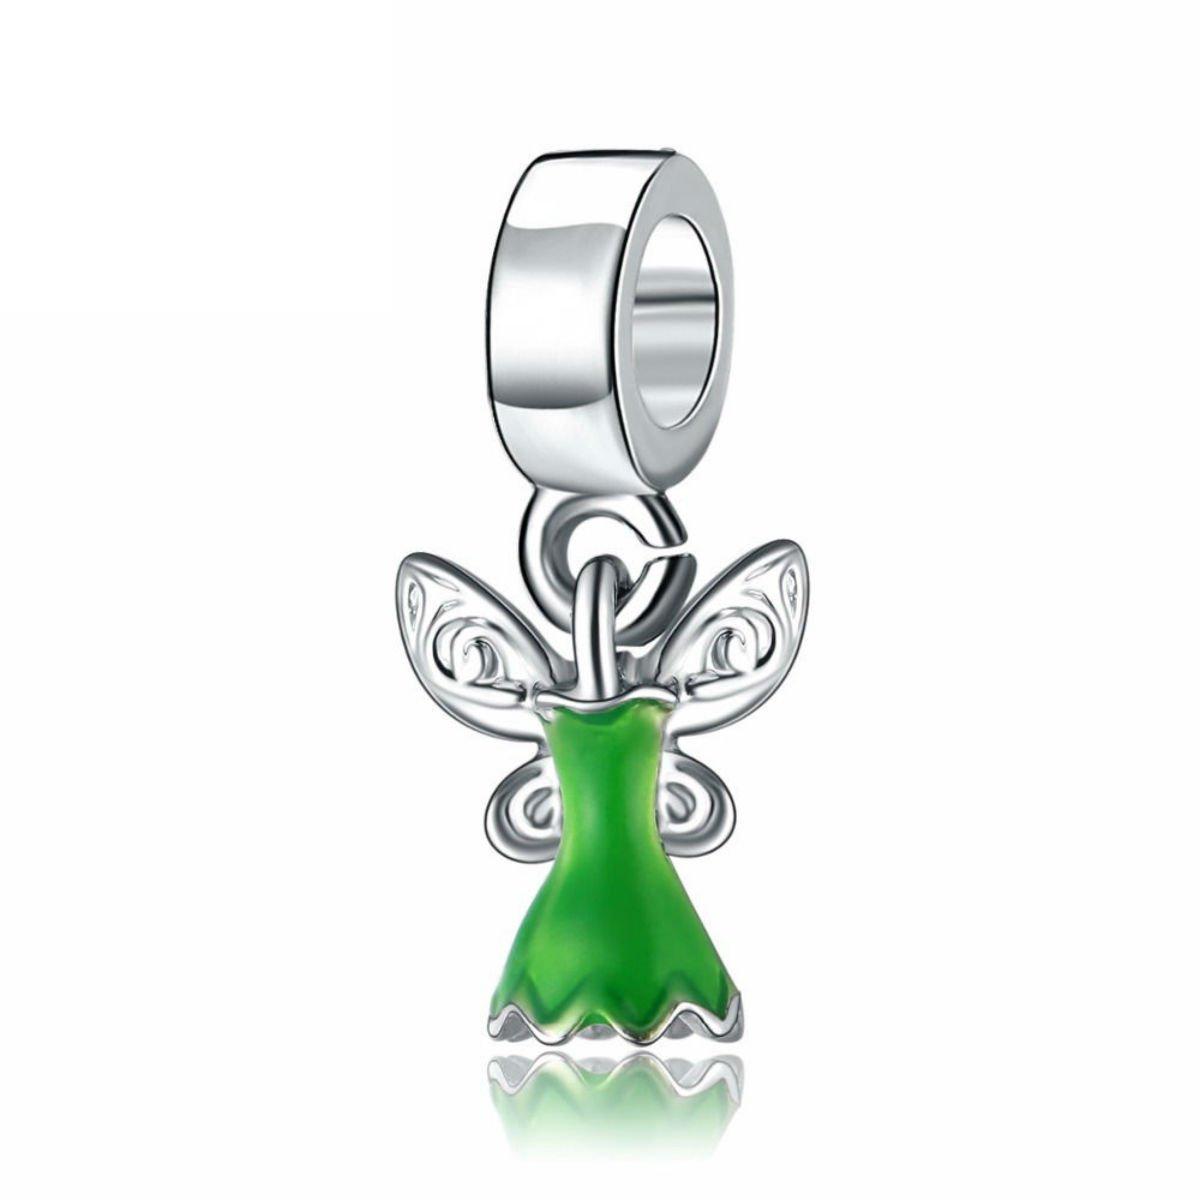 Tinkerbell Dress Disney Character Silver Pendant Charm for Pandora Bracelet Jewelry